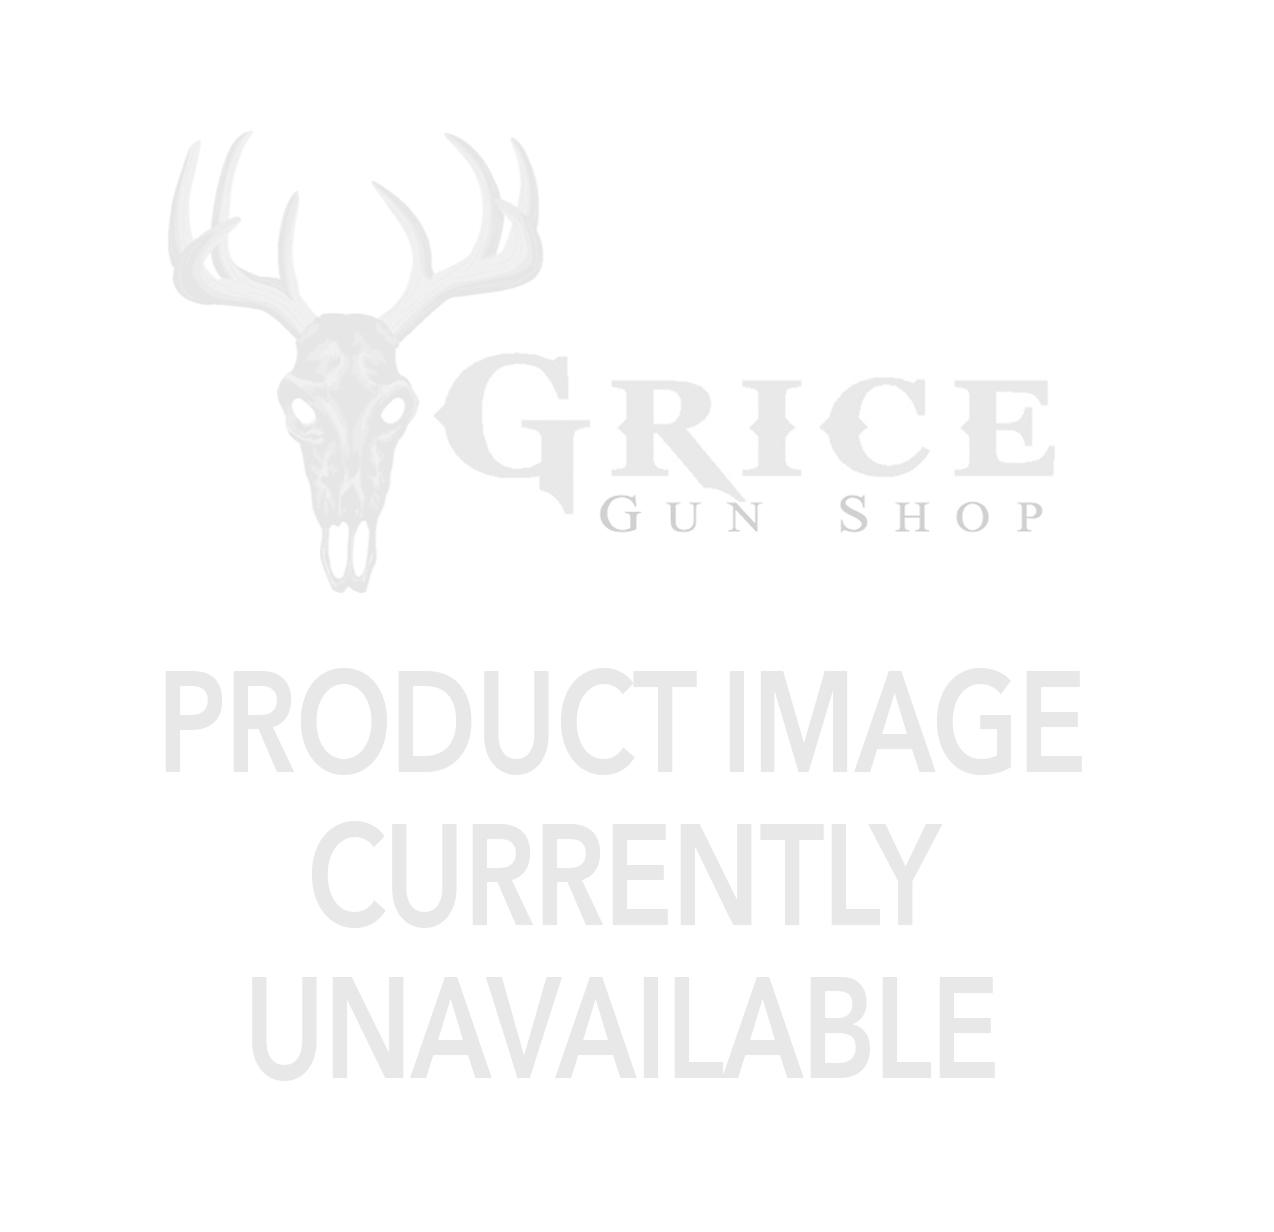 STACK-ON - Total Defense 40 Gun Pebble Gray Safe (Biometric Lock)